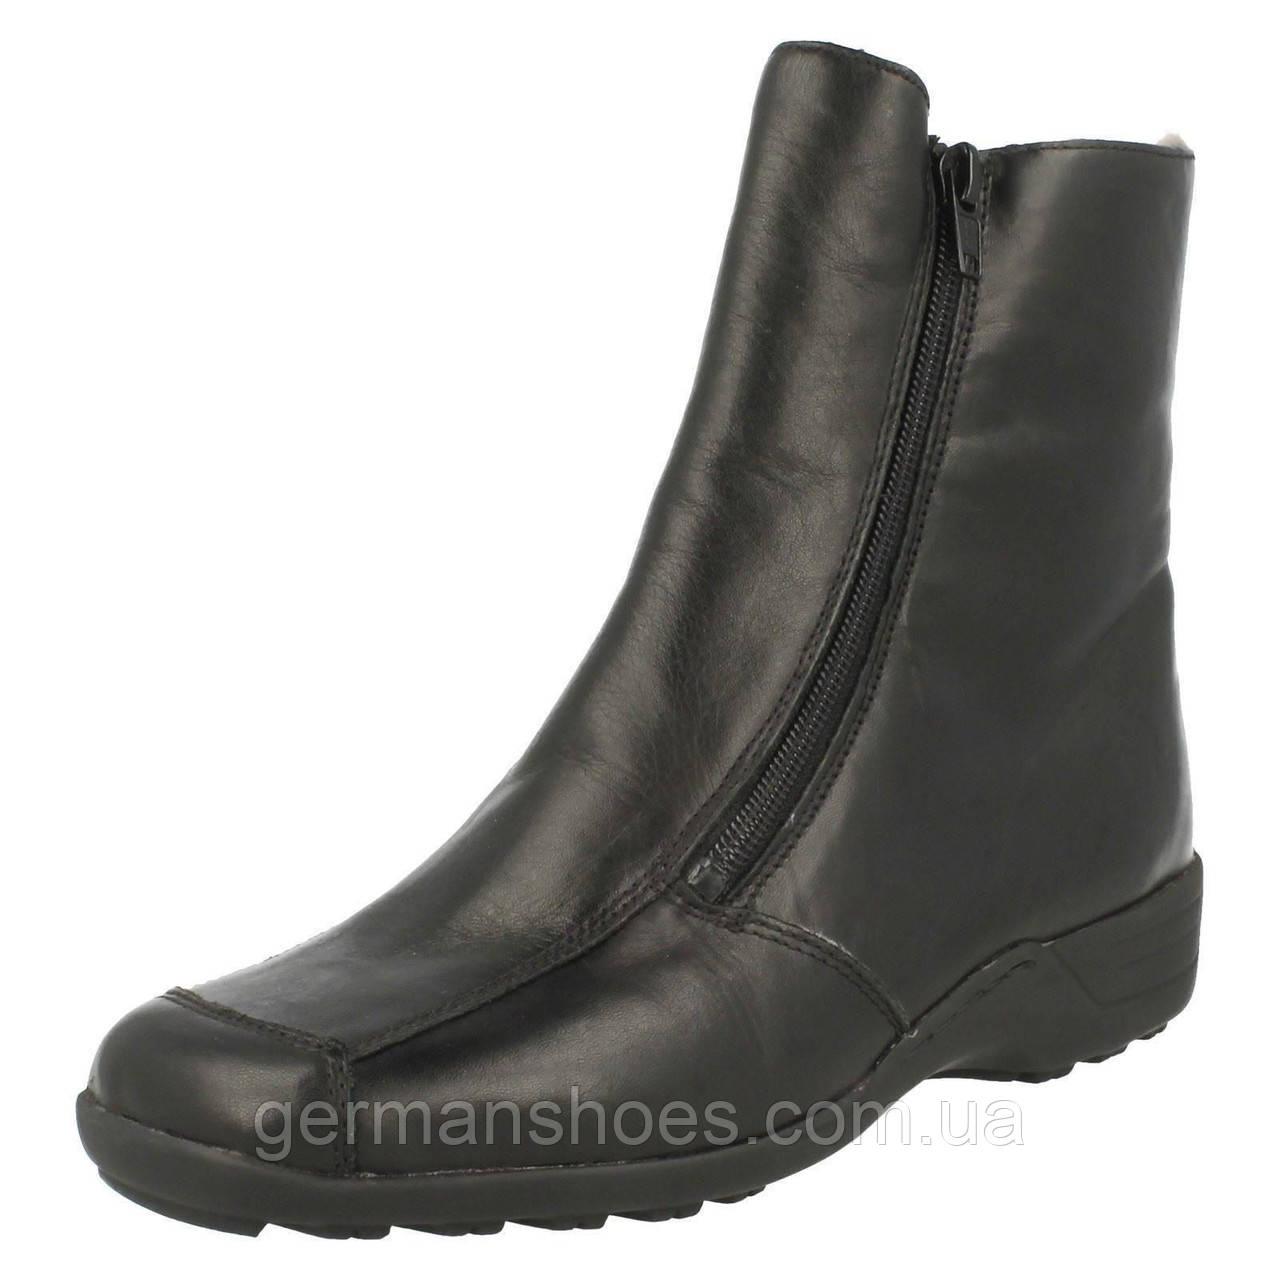 Ботинки женские Remonte D0575-01